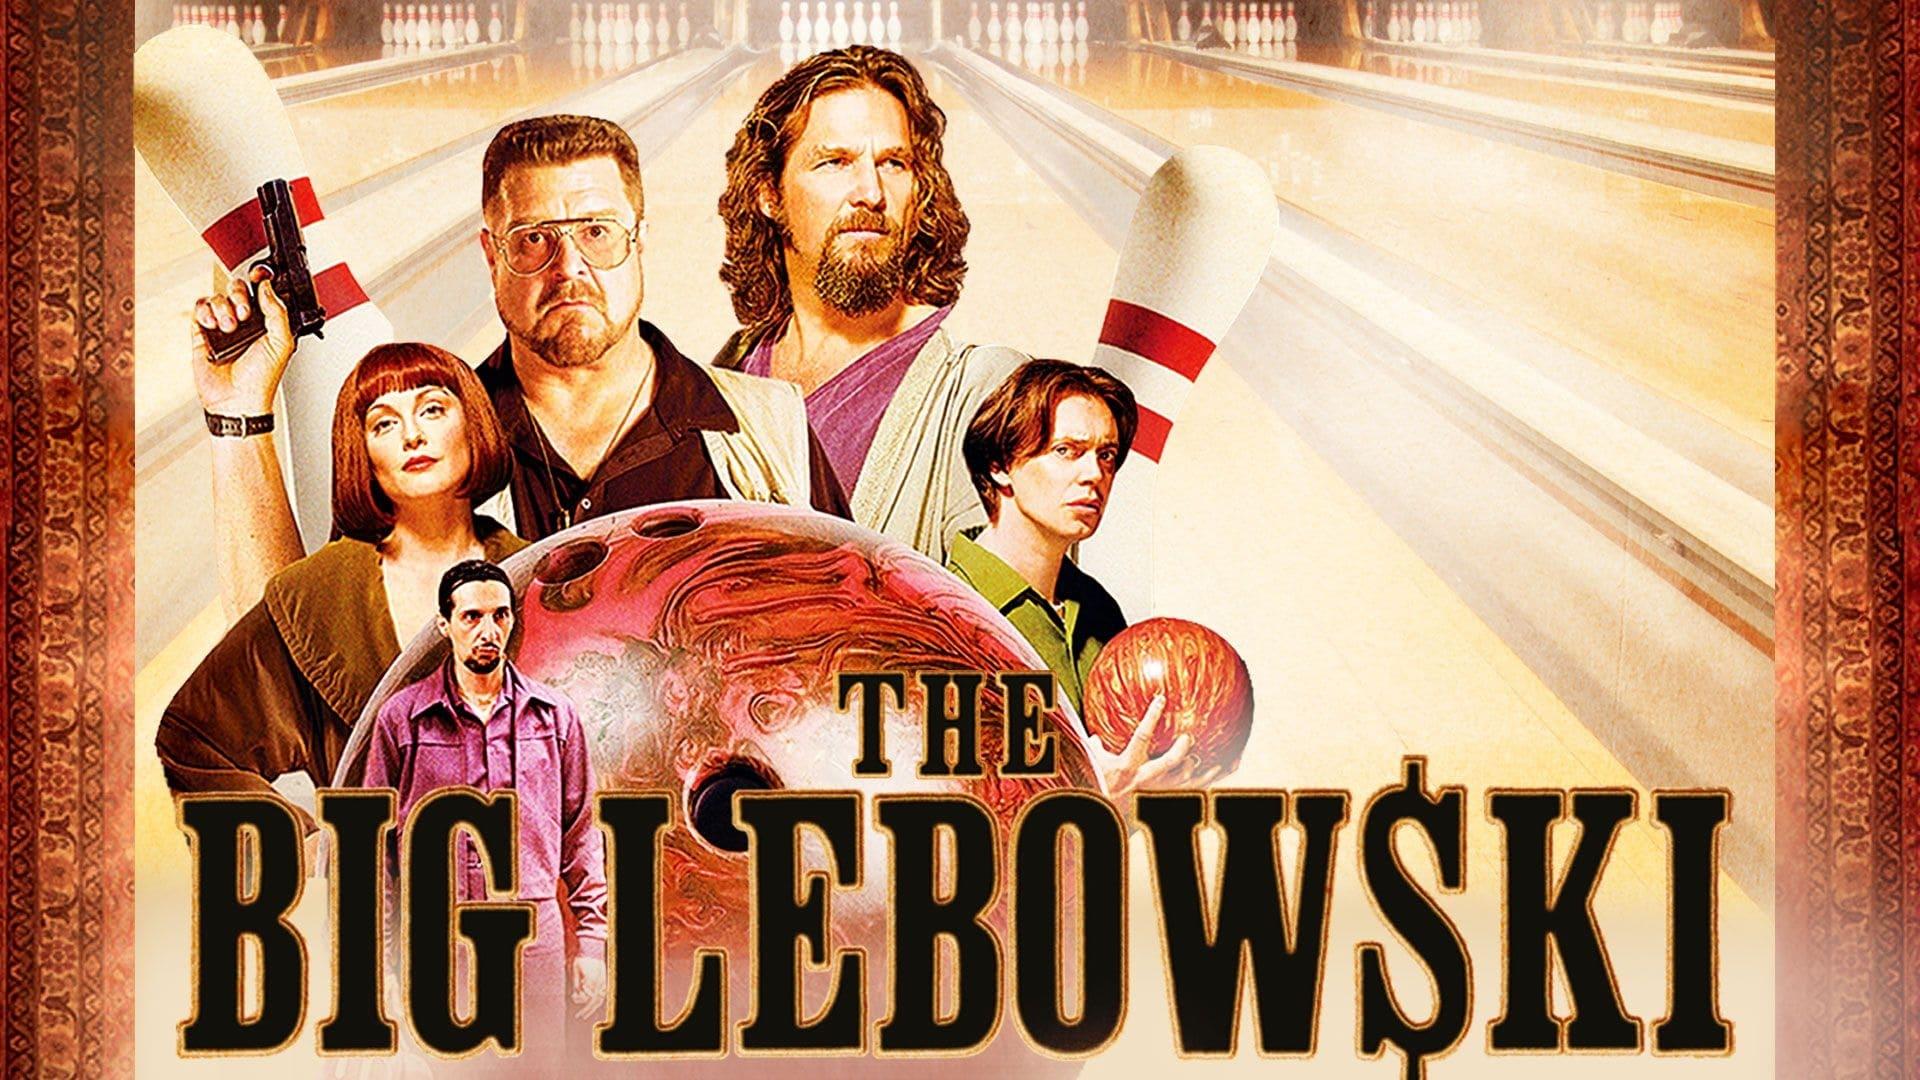 The Big Lebowski Streaming